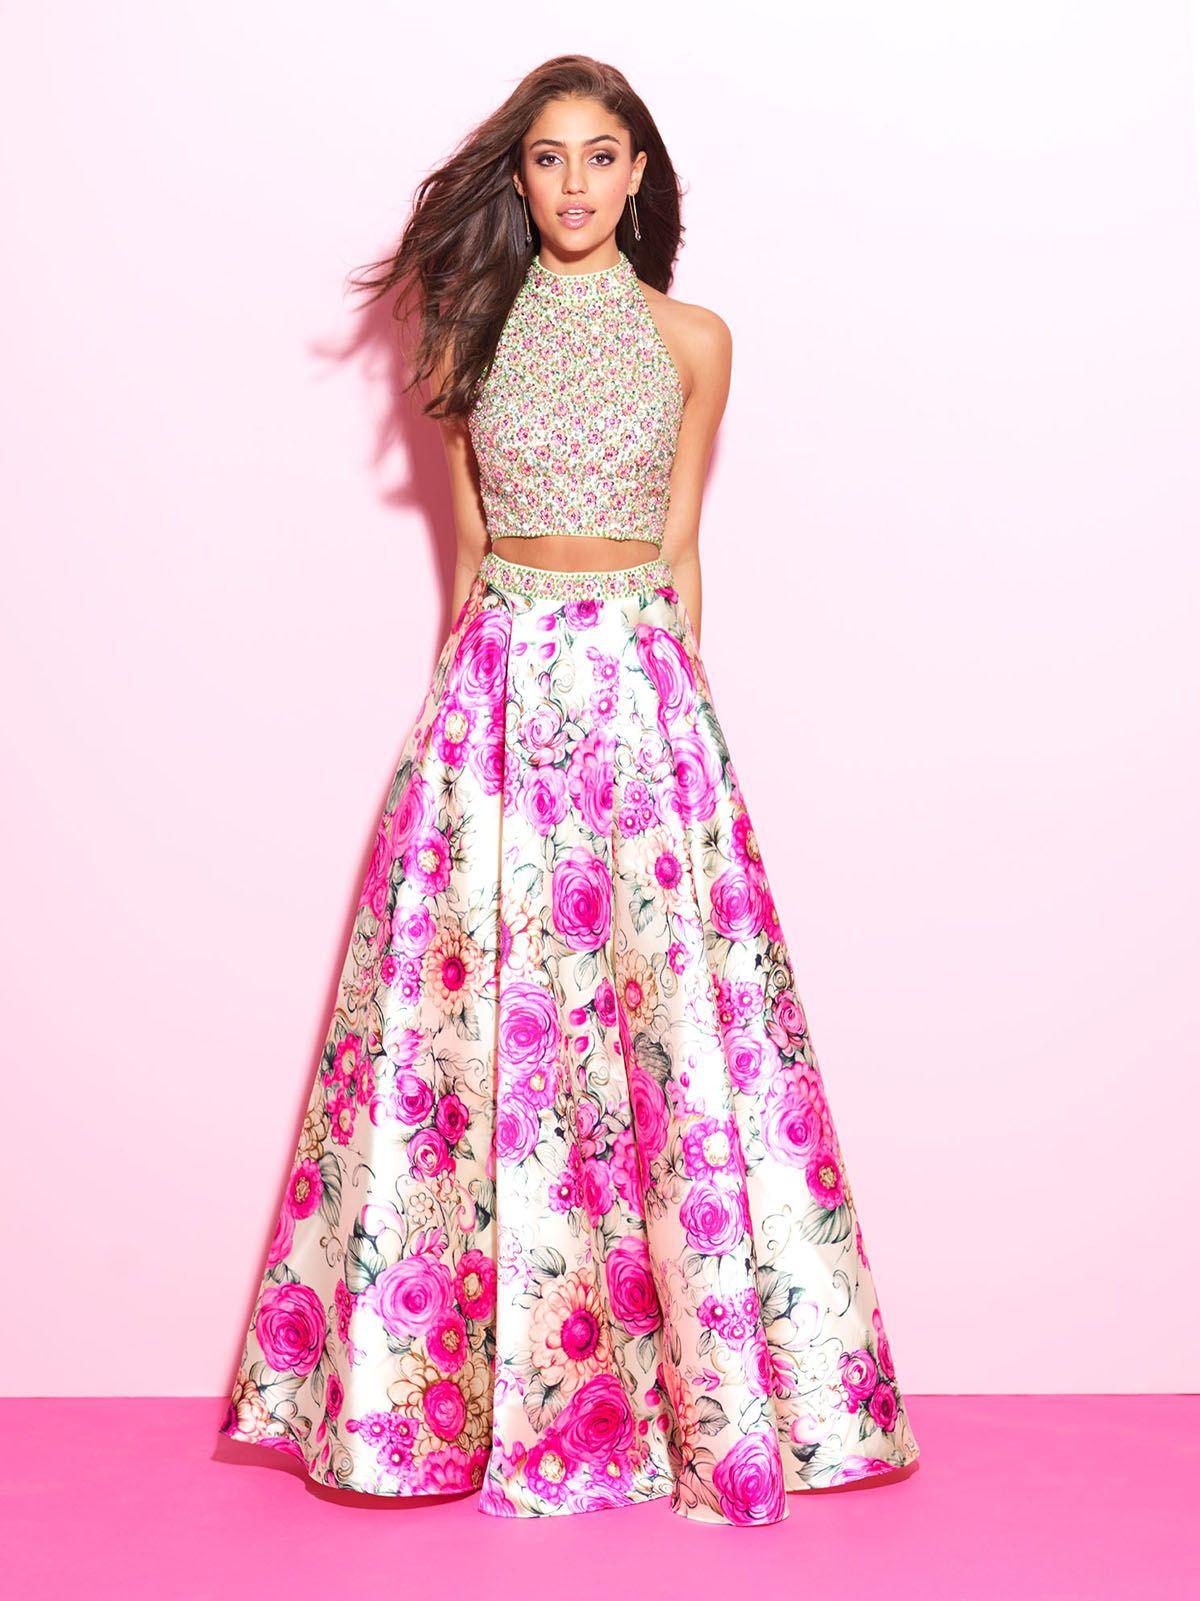 ♡Pinterest⇾ Pneyati | vestidos | Pinterest | Trajes de moda, Traje ...